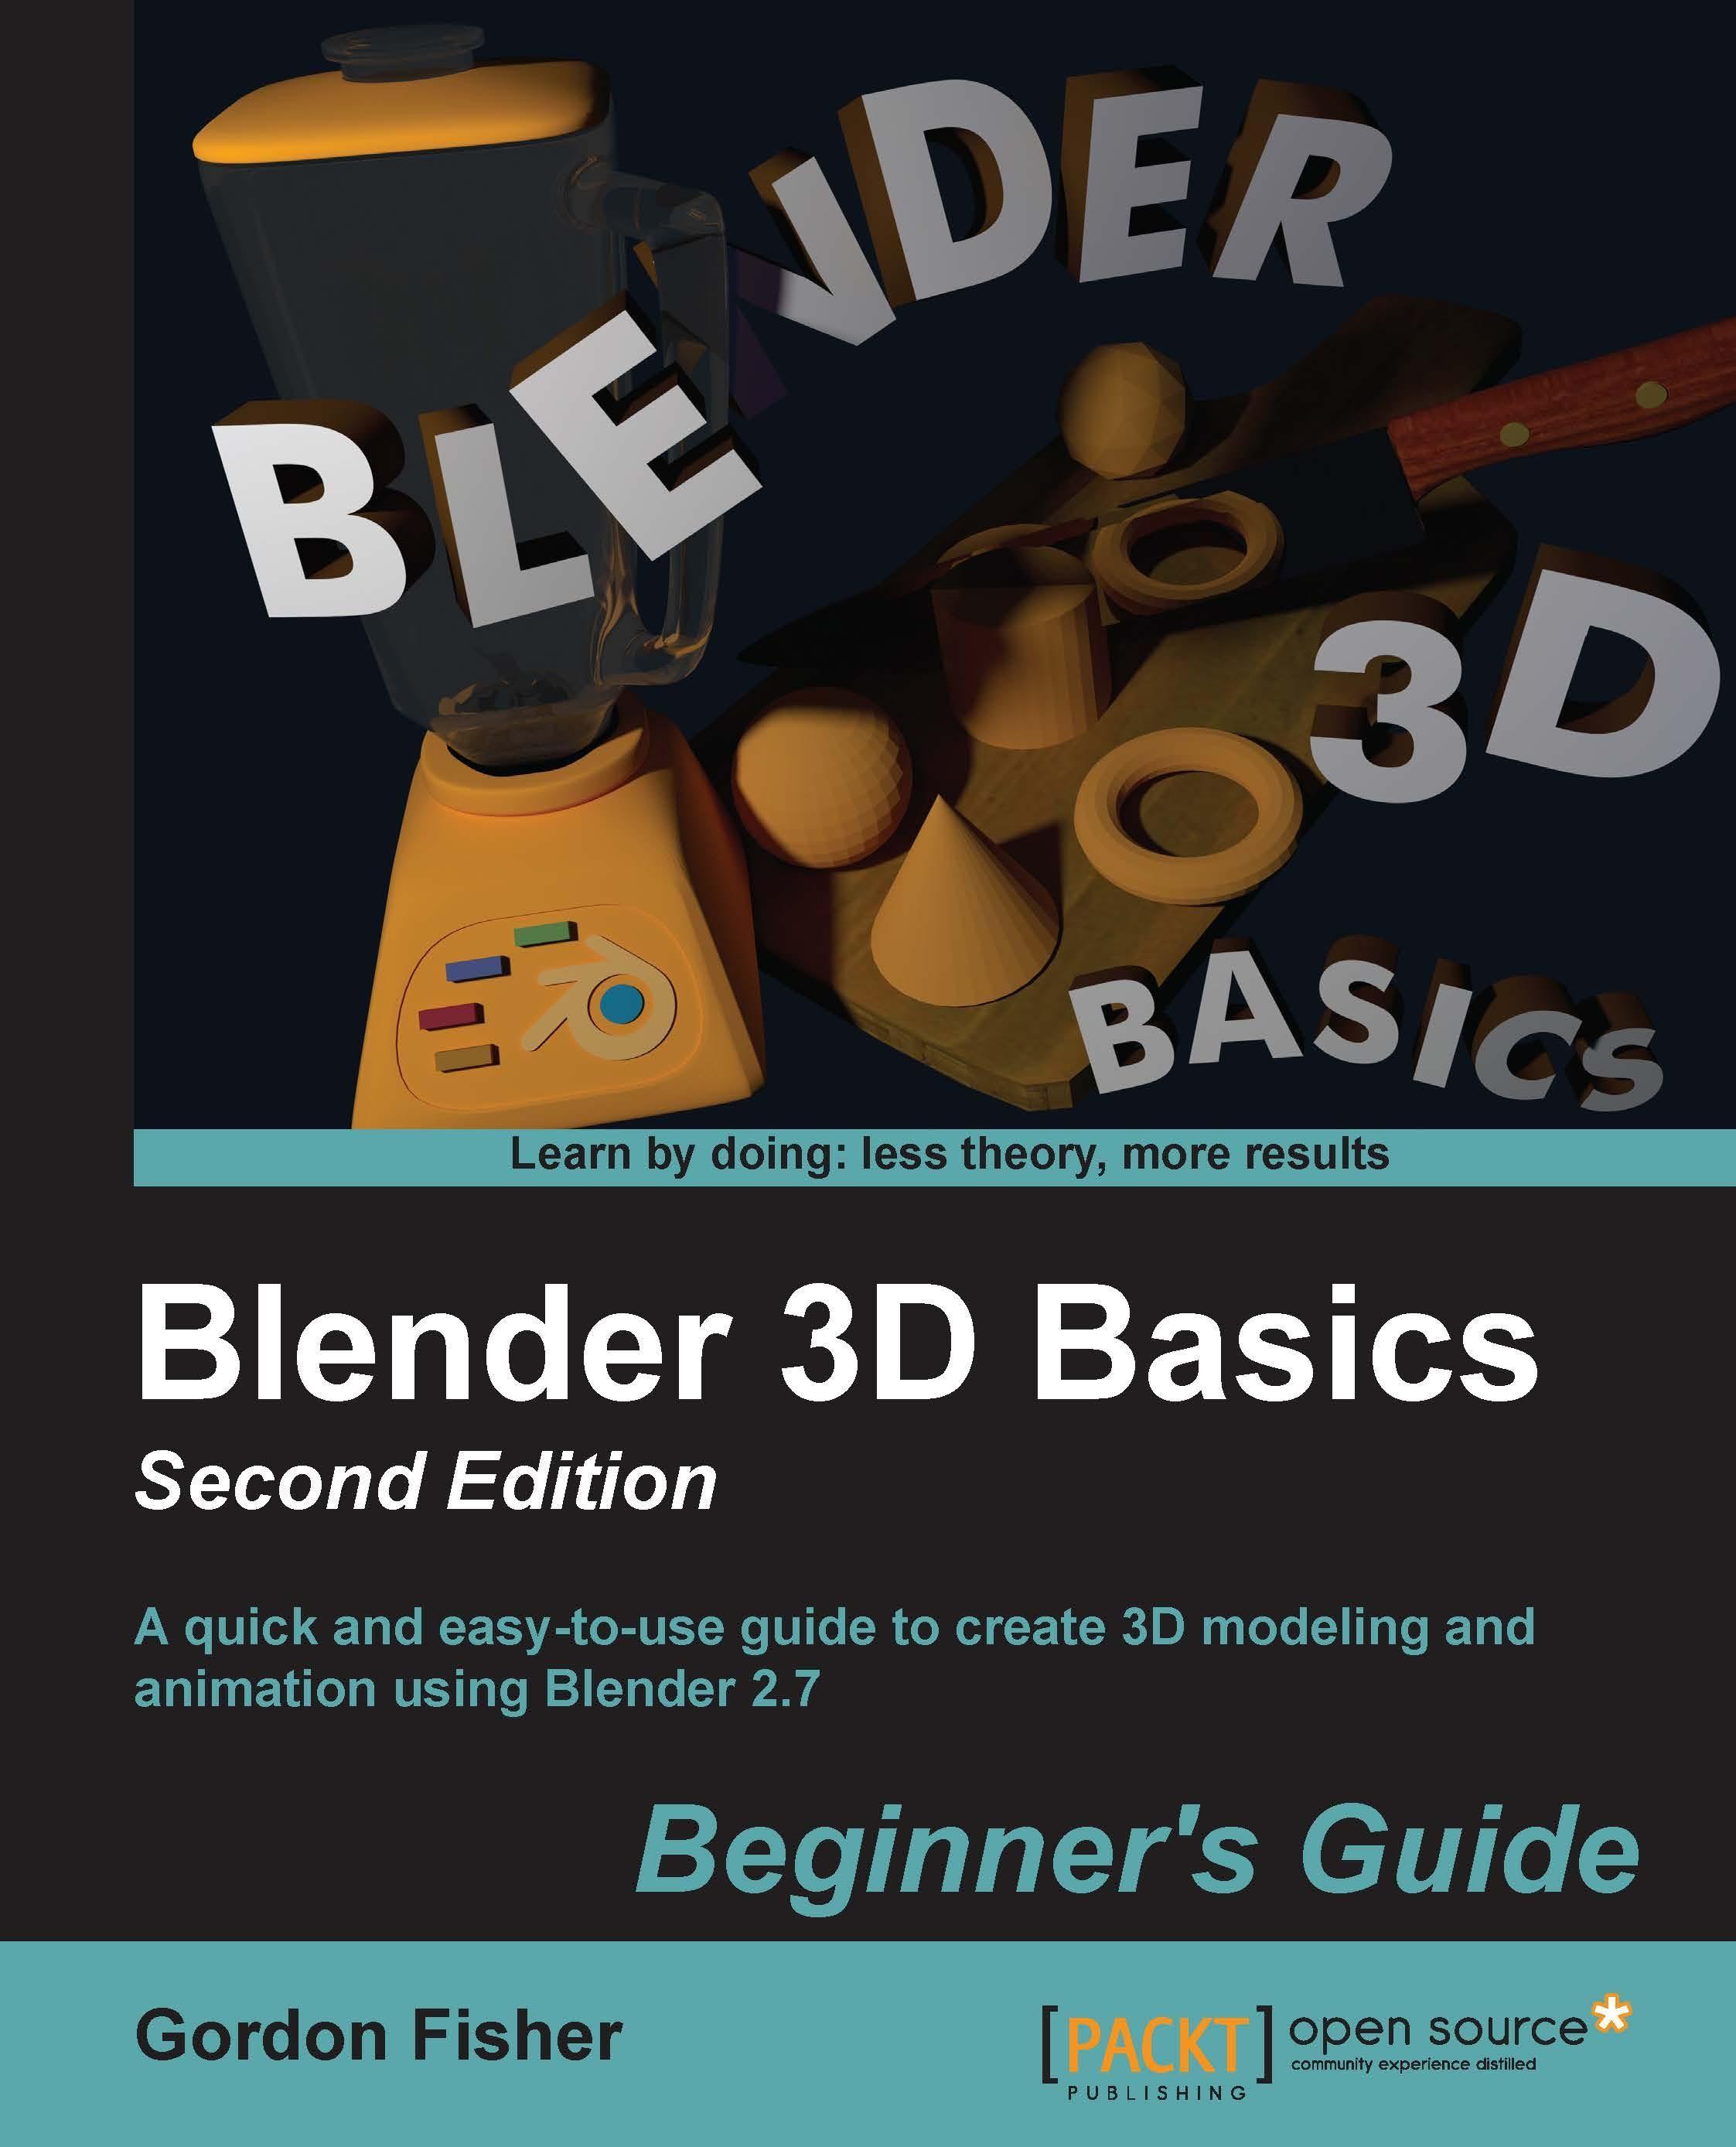 Blender 3D Basics Beginner's Guide Second Edition How to